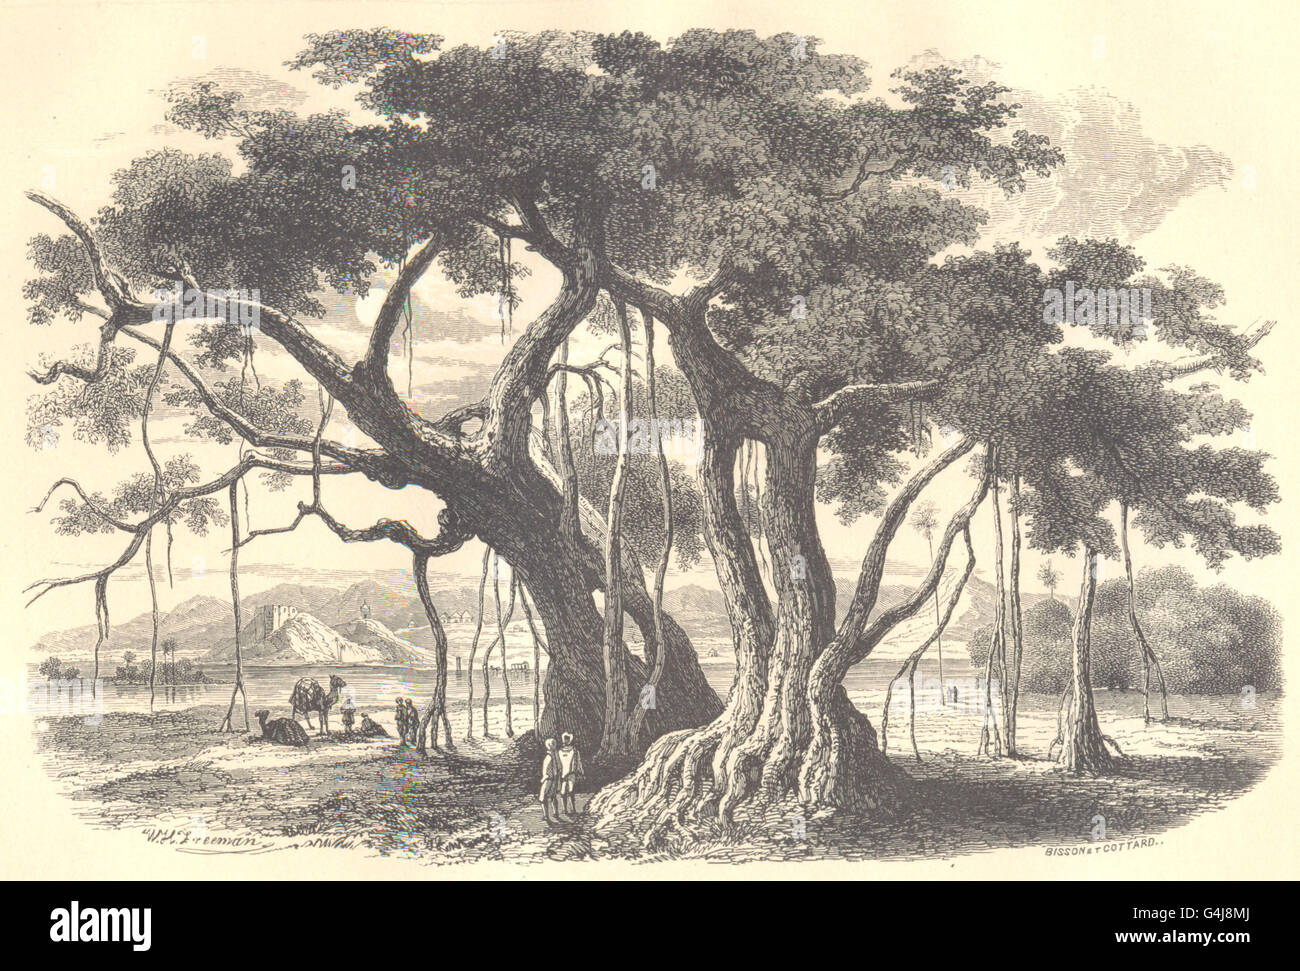 BOTANICALS: Figuier des pagodes. Ficus religiosa. (Morées) , old print 1852 Stock Photo